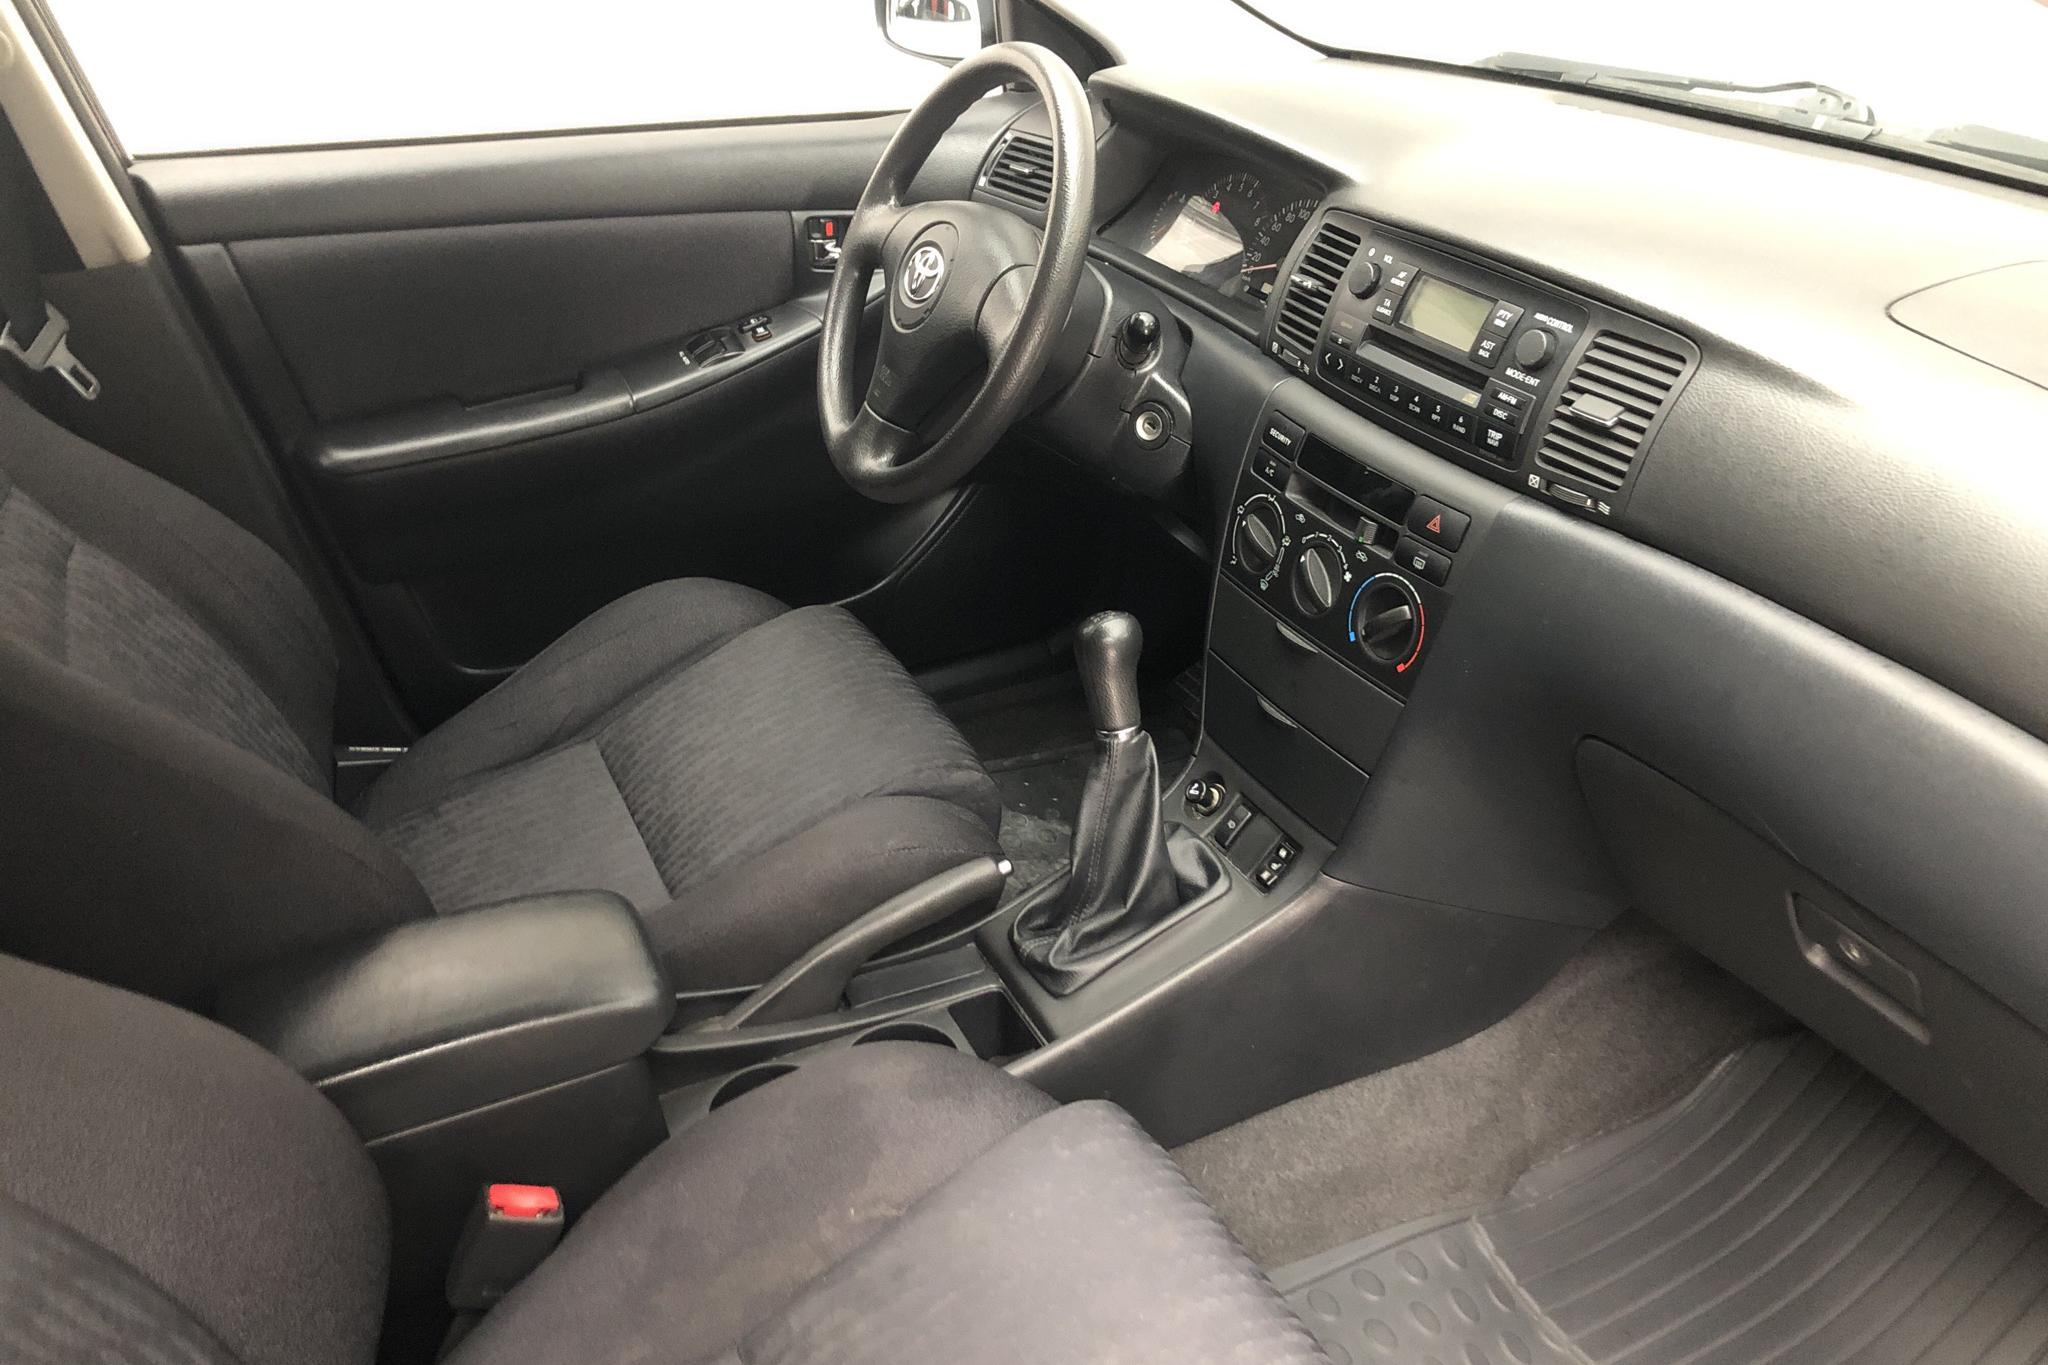 Toyota Corolla 1.4 5dr (97hk) - 18 278 mil - Manuell - Dark Green - 2003